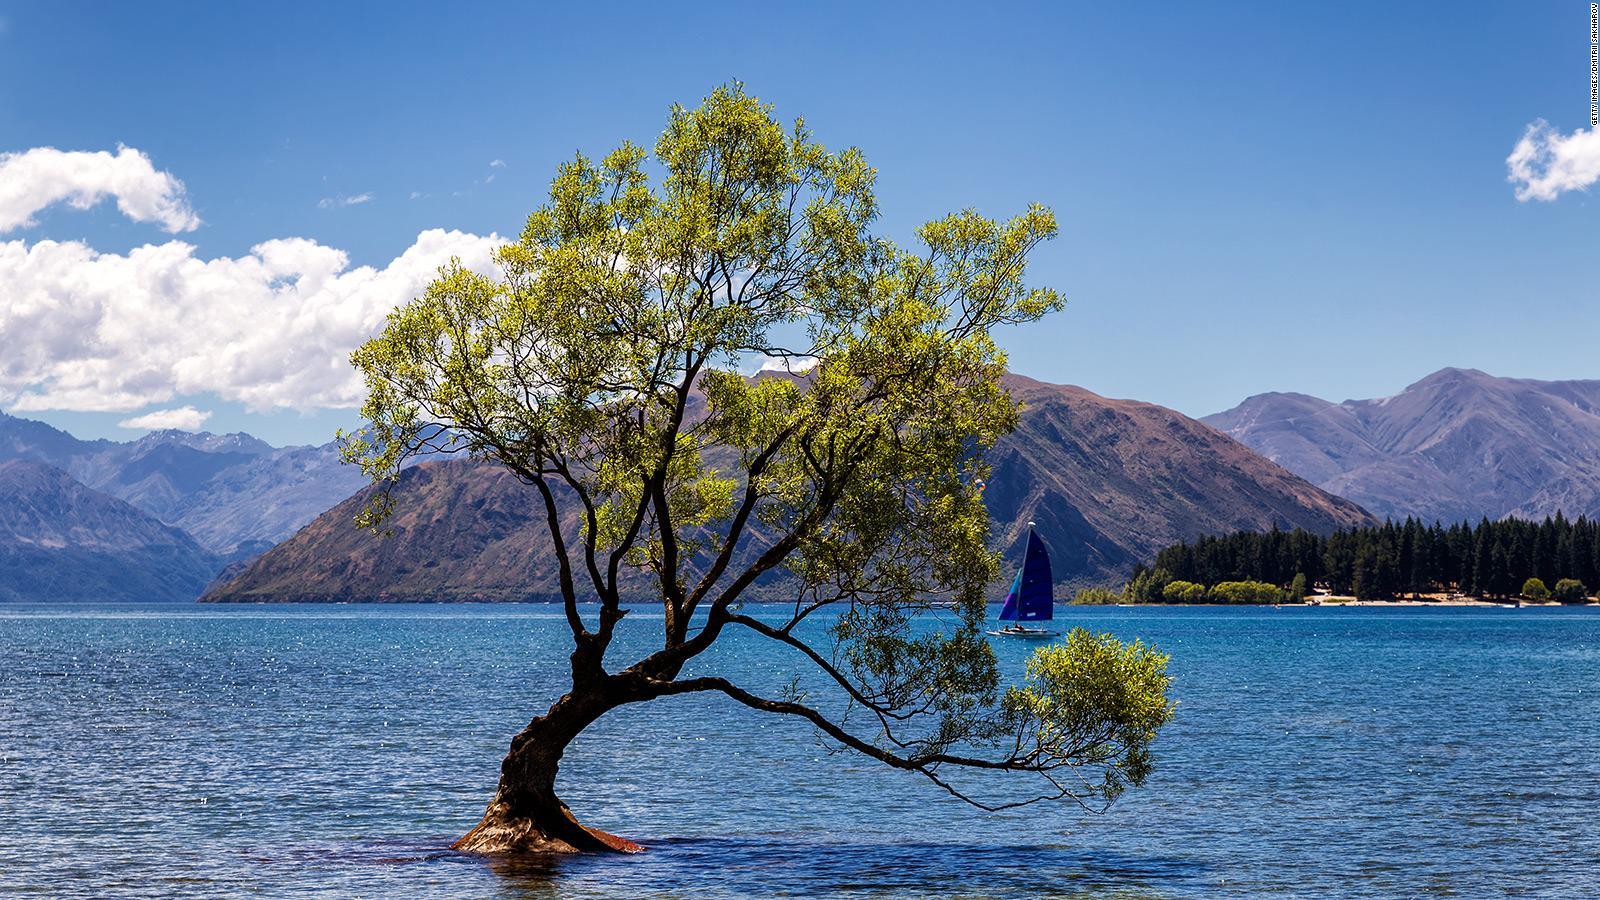 That Wanaka Tree,' New Zealand's most famous tree, vandalized | CNN Travel